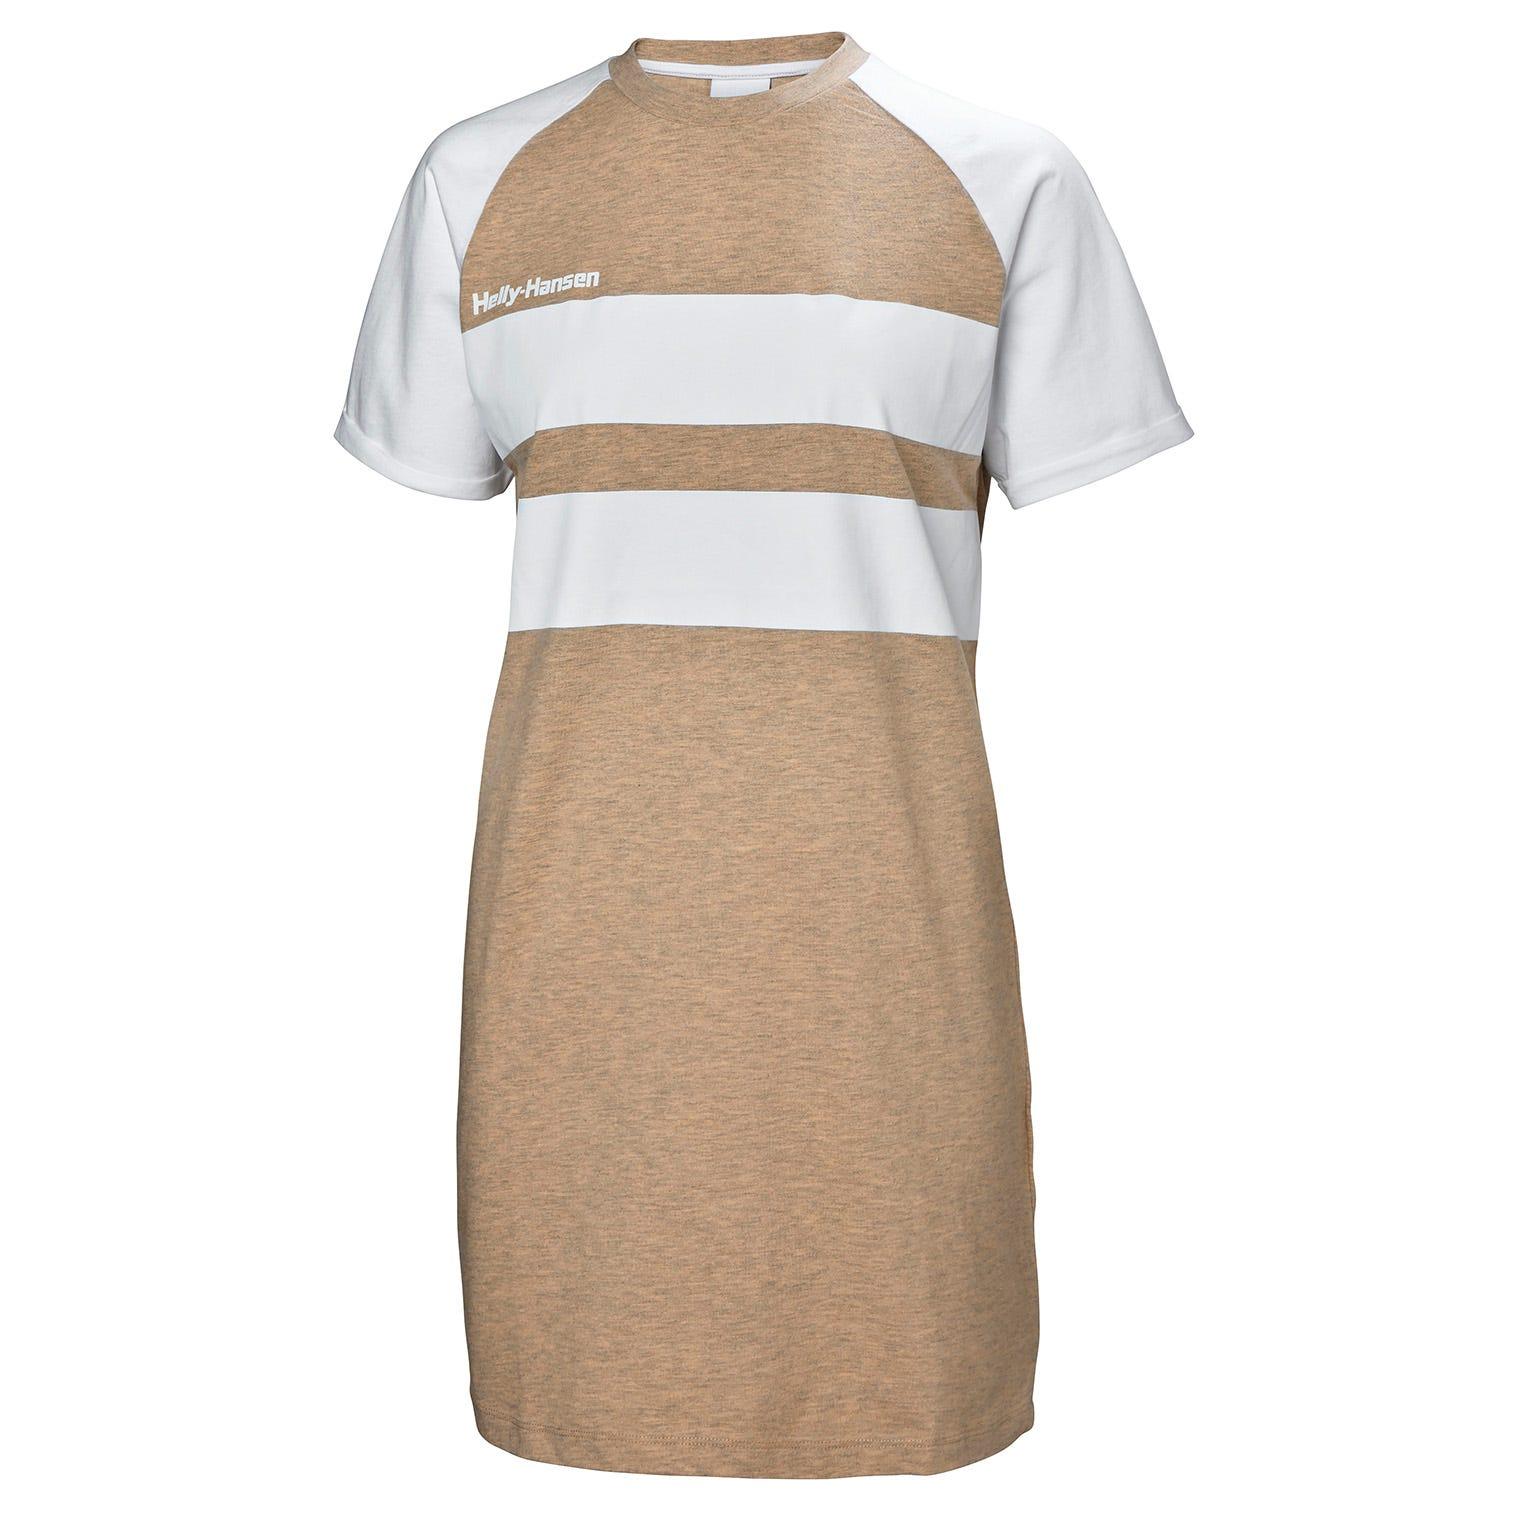 Helly Hansen Heritage Tshirt Dress Womens Rain Jacket Beige XL